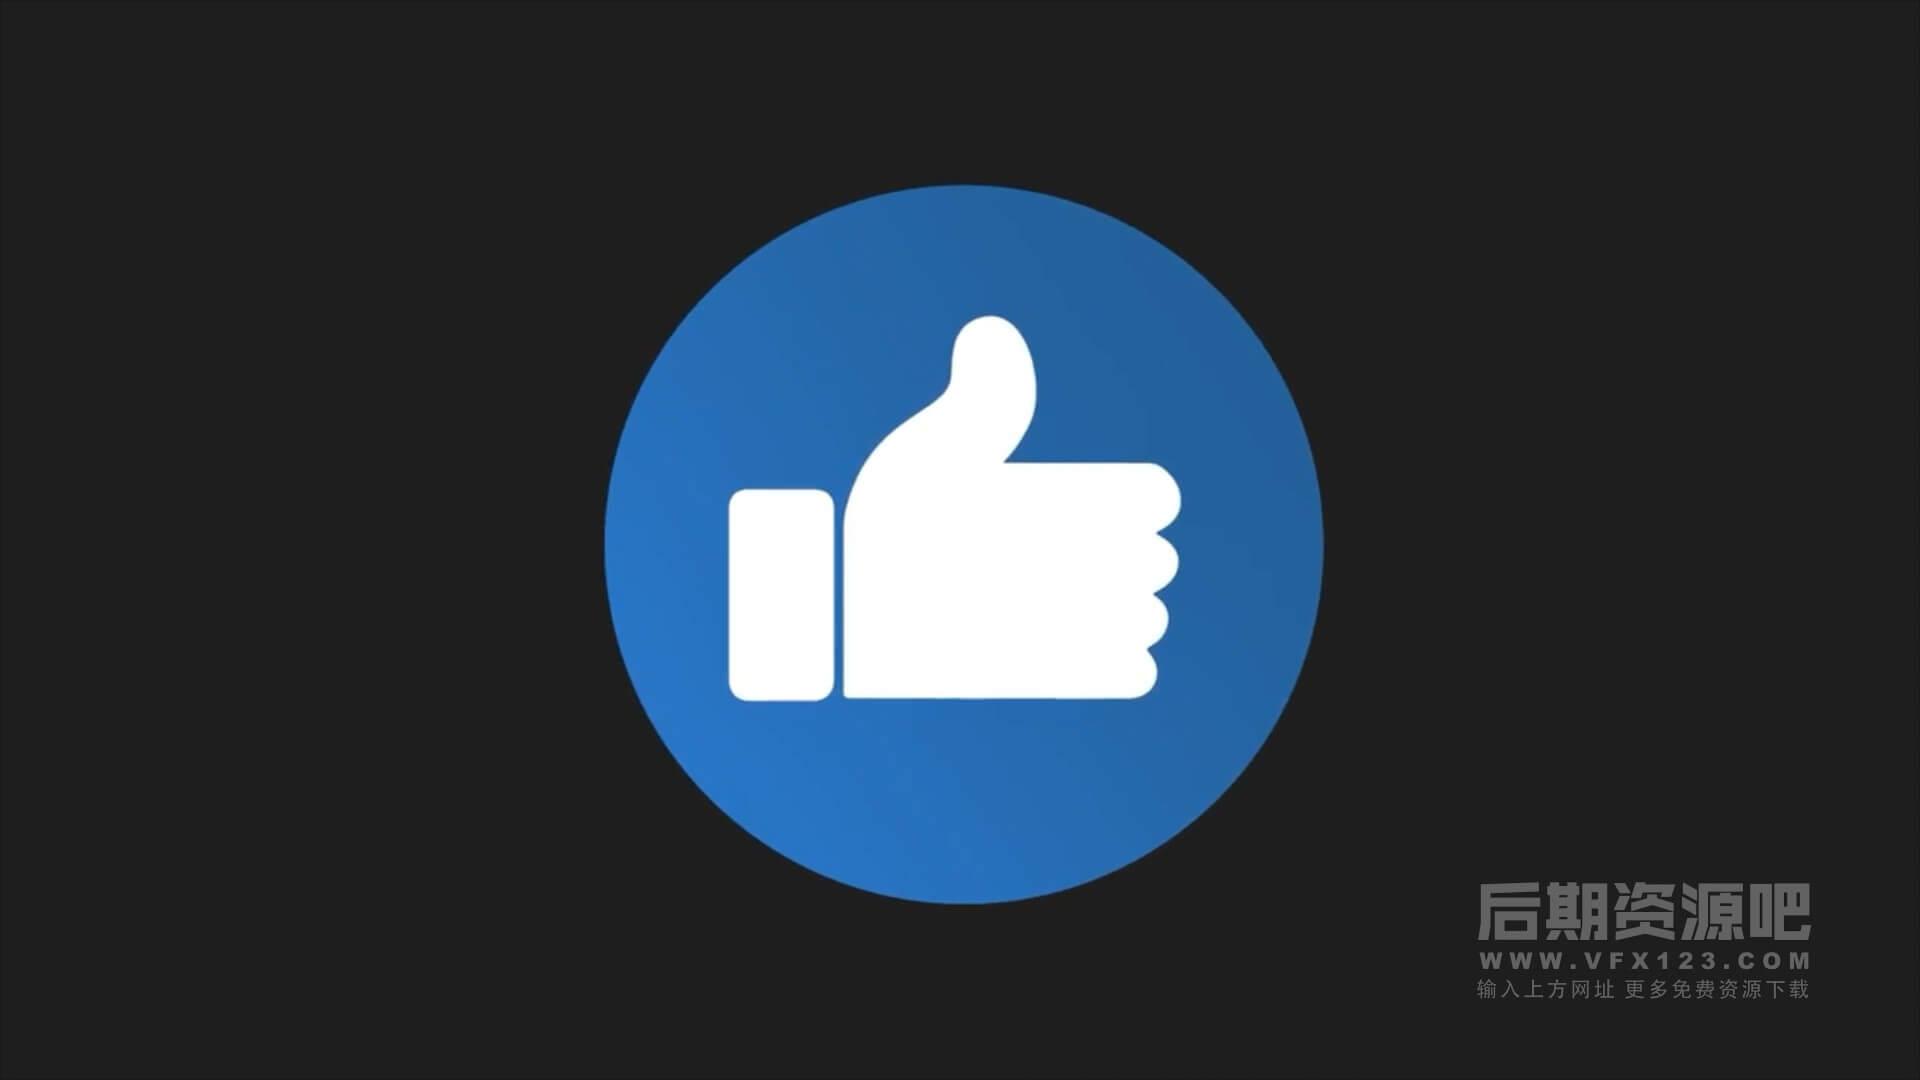 Fcpx插件 13个有趣搞笑喜欢表情可控制颜色社交媒体素材包 Emojis Pack